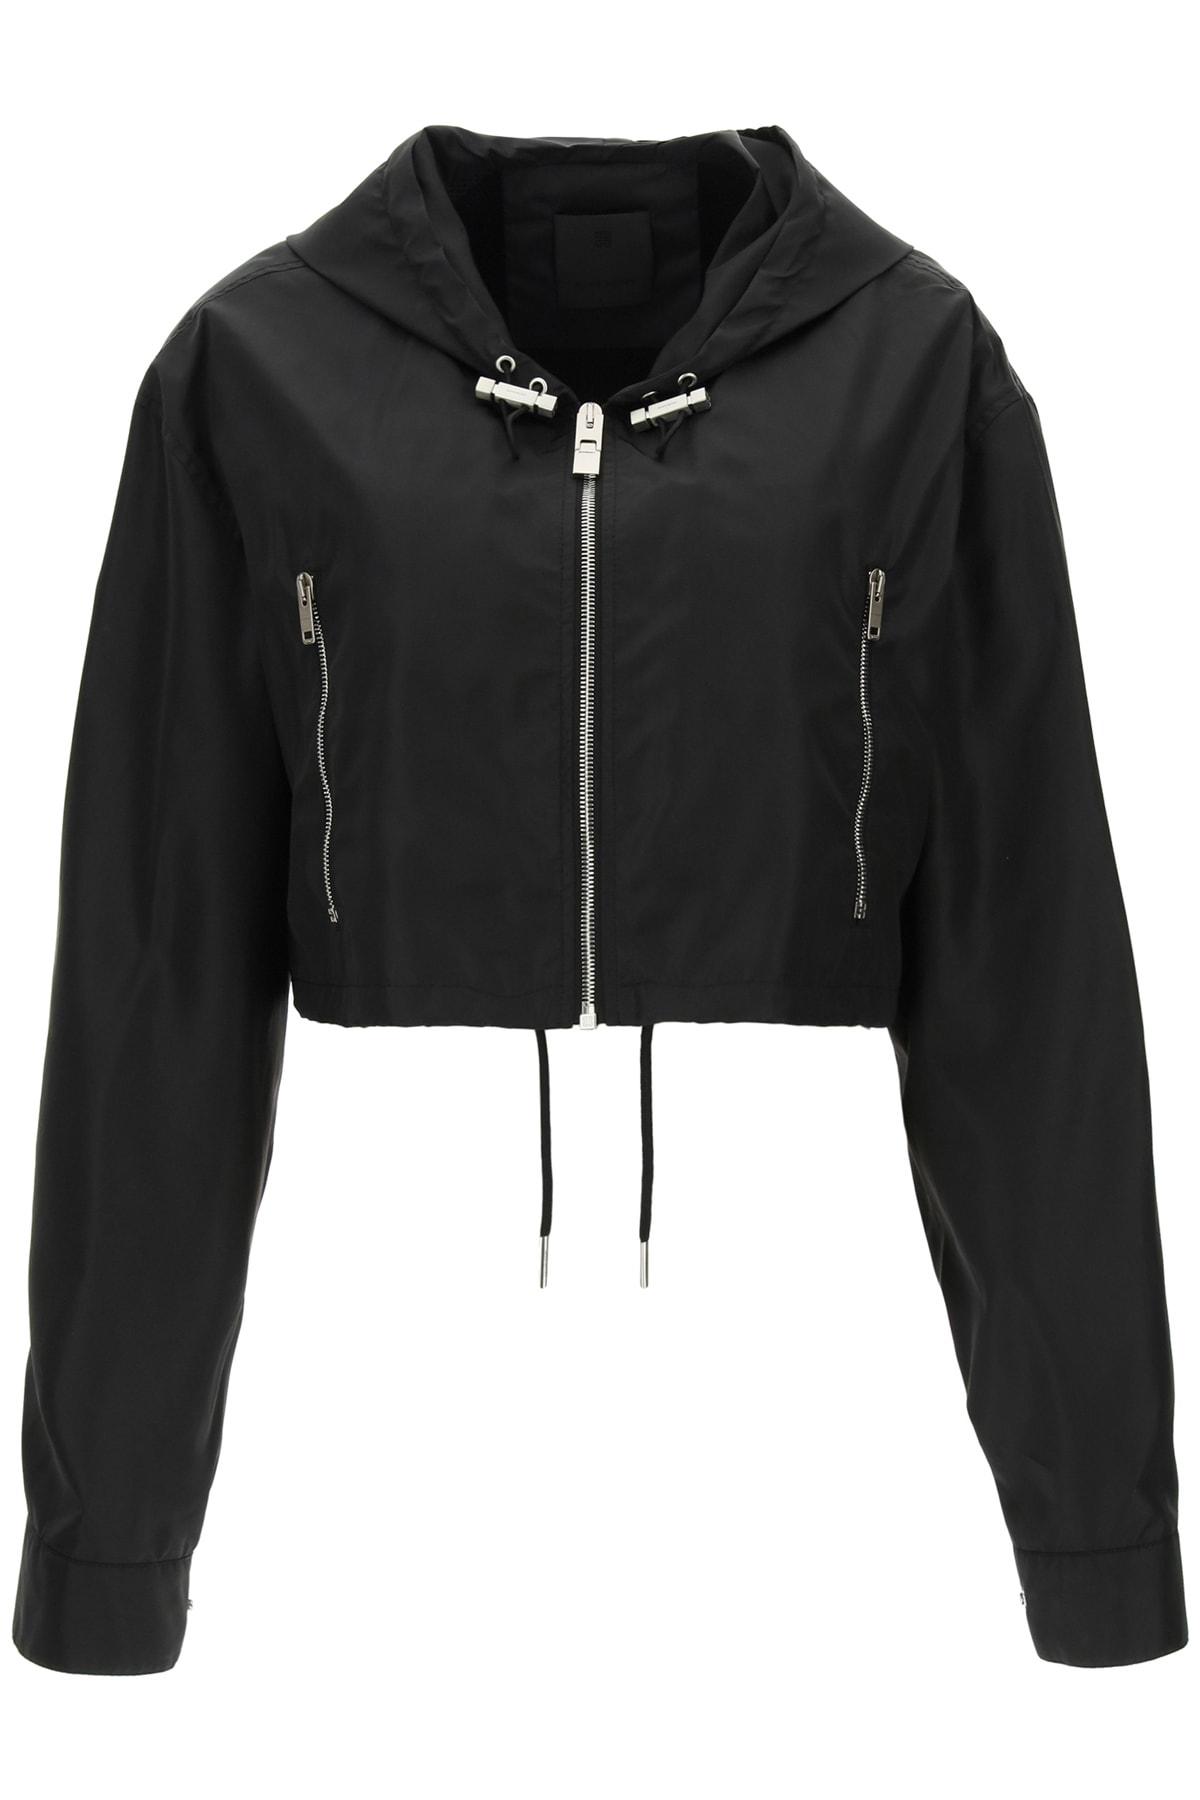 Givenchy Jackets CROPPED NYLON JACKET